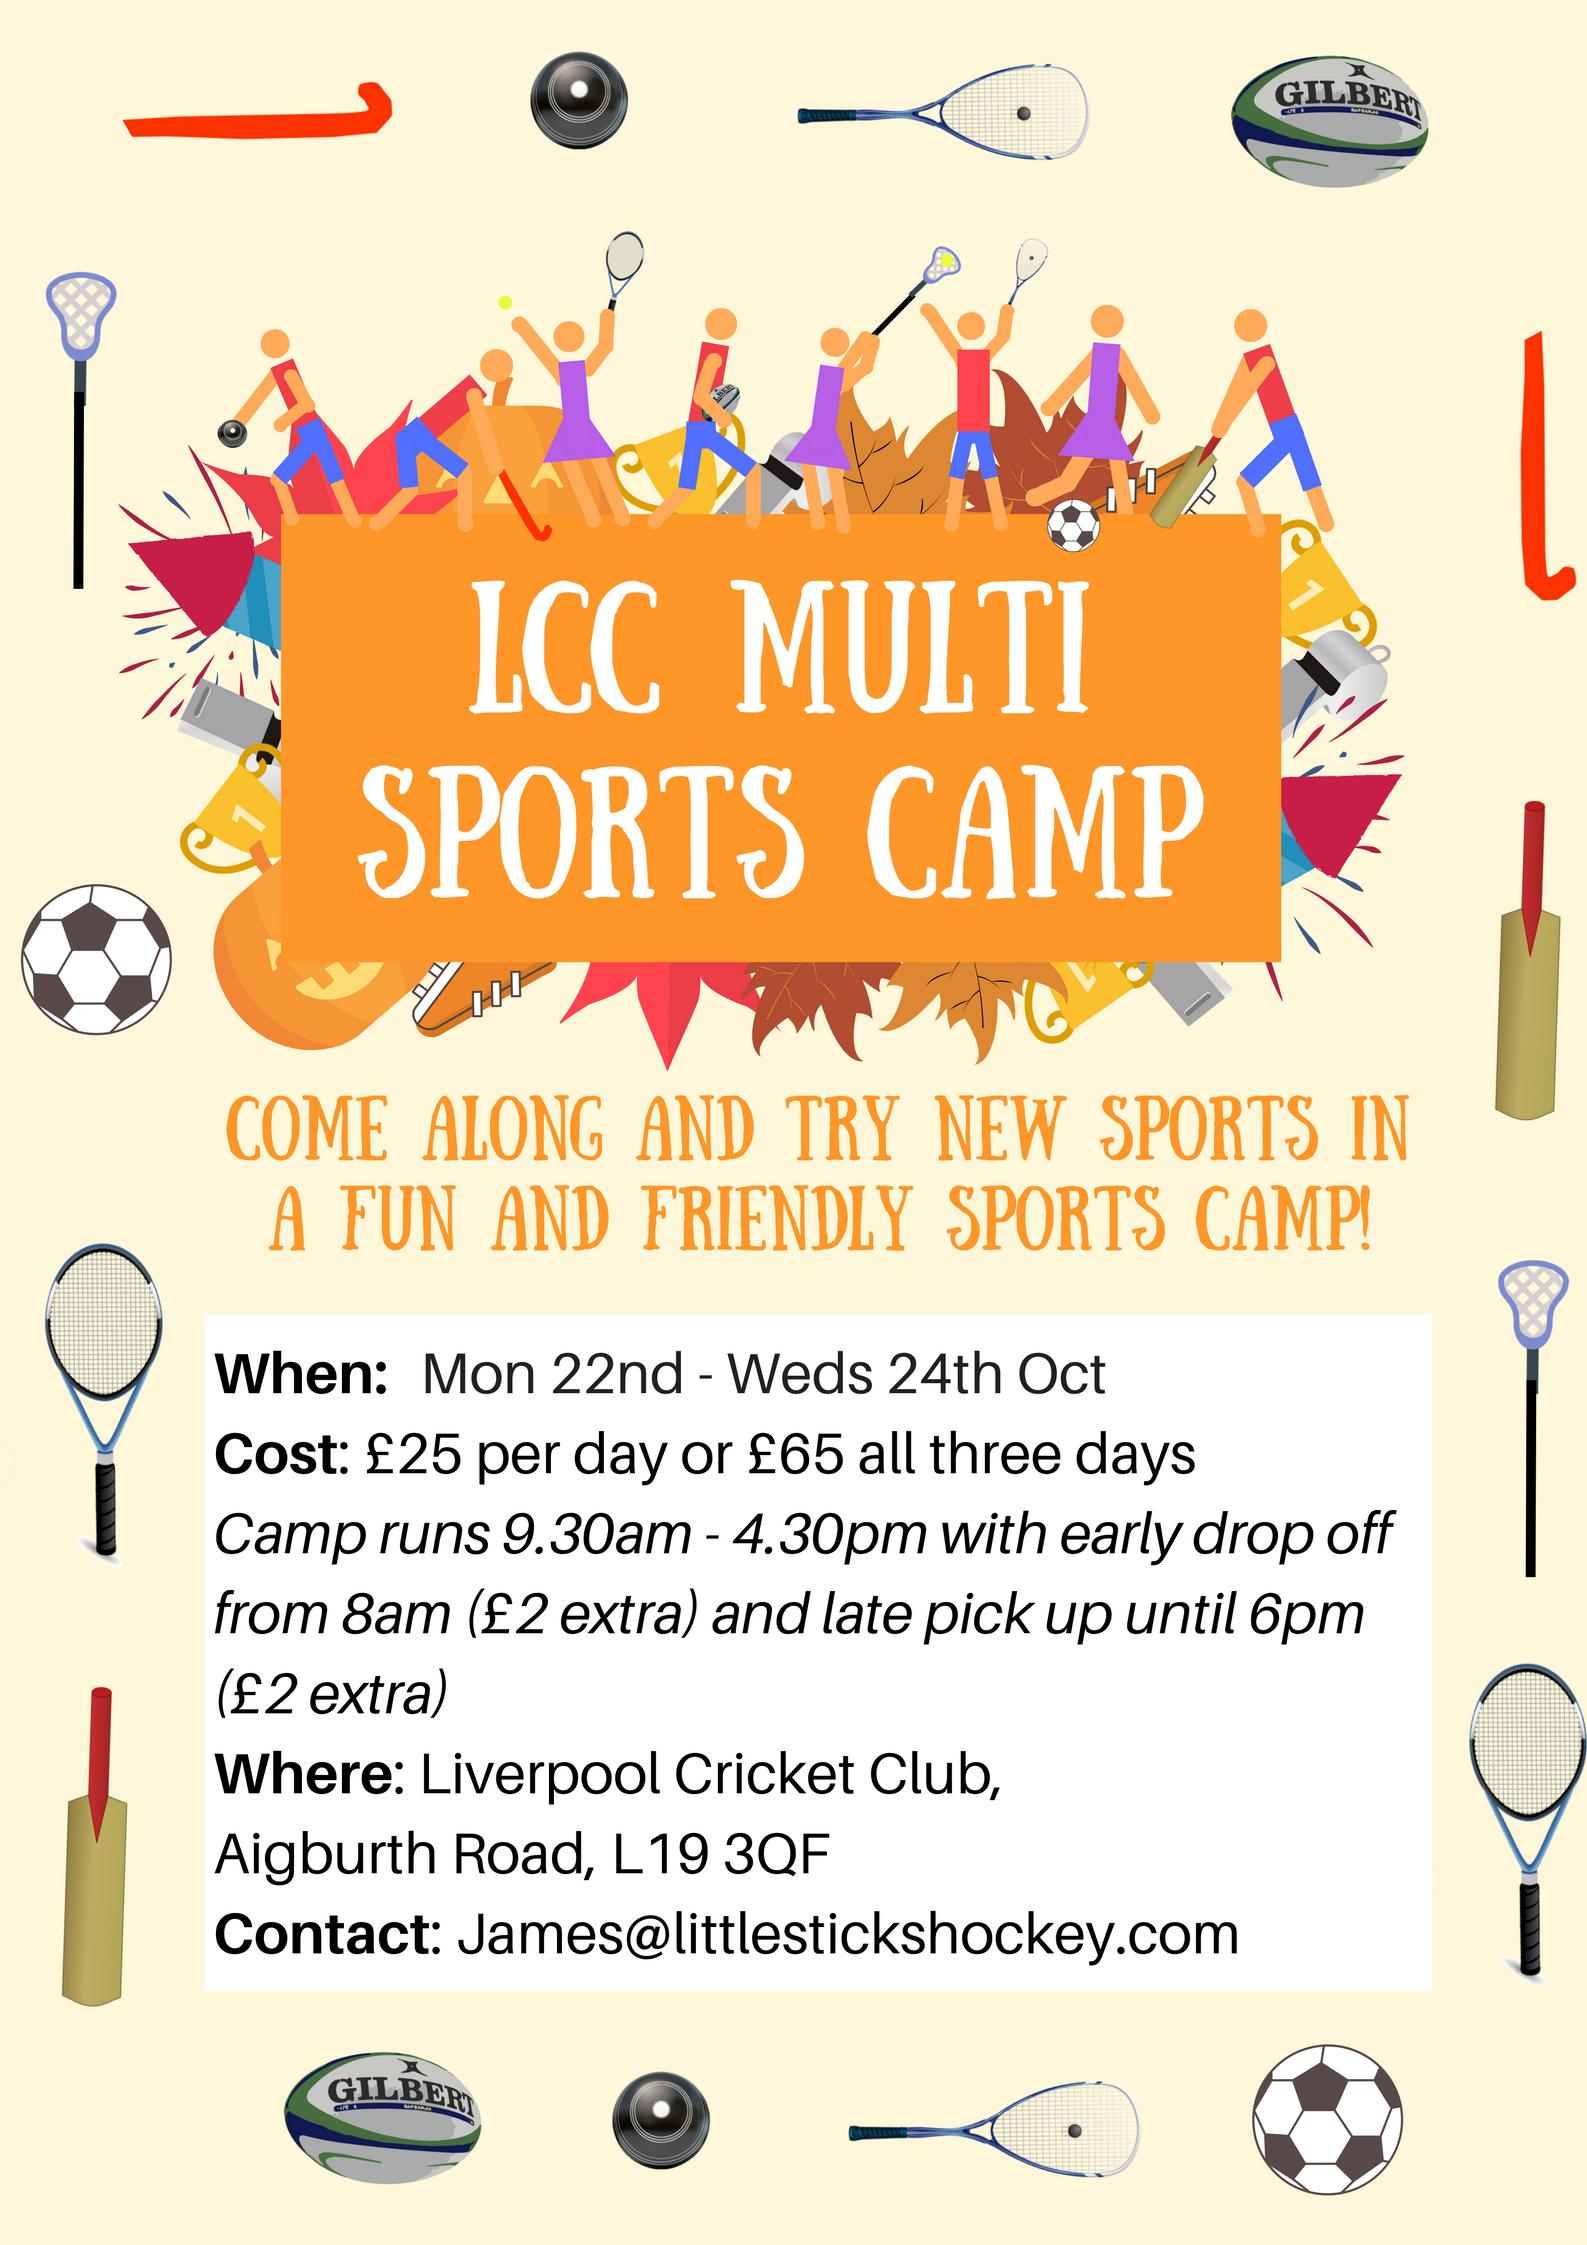 October Half-Term Multi Sports Camp